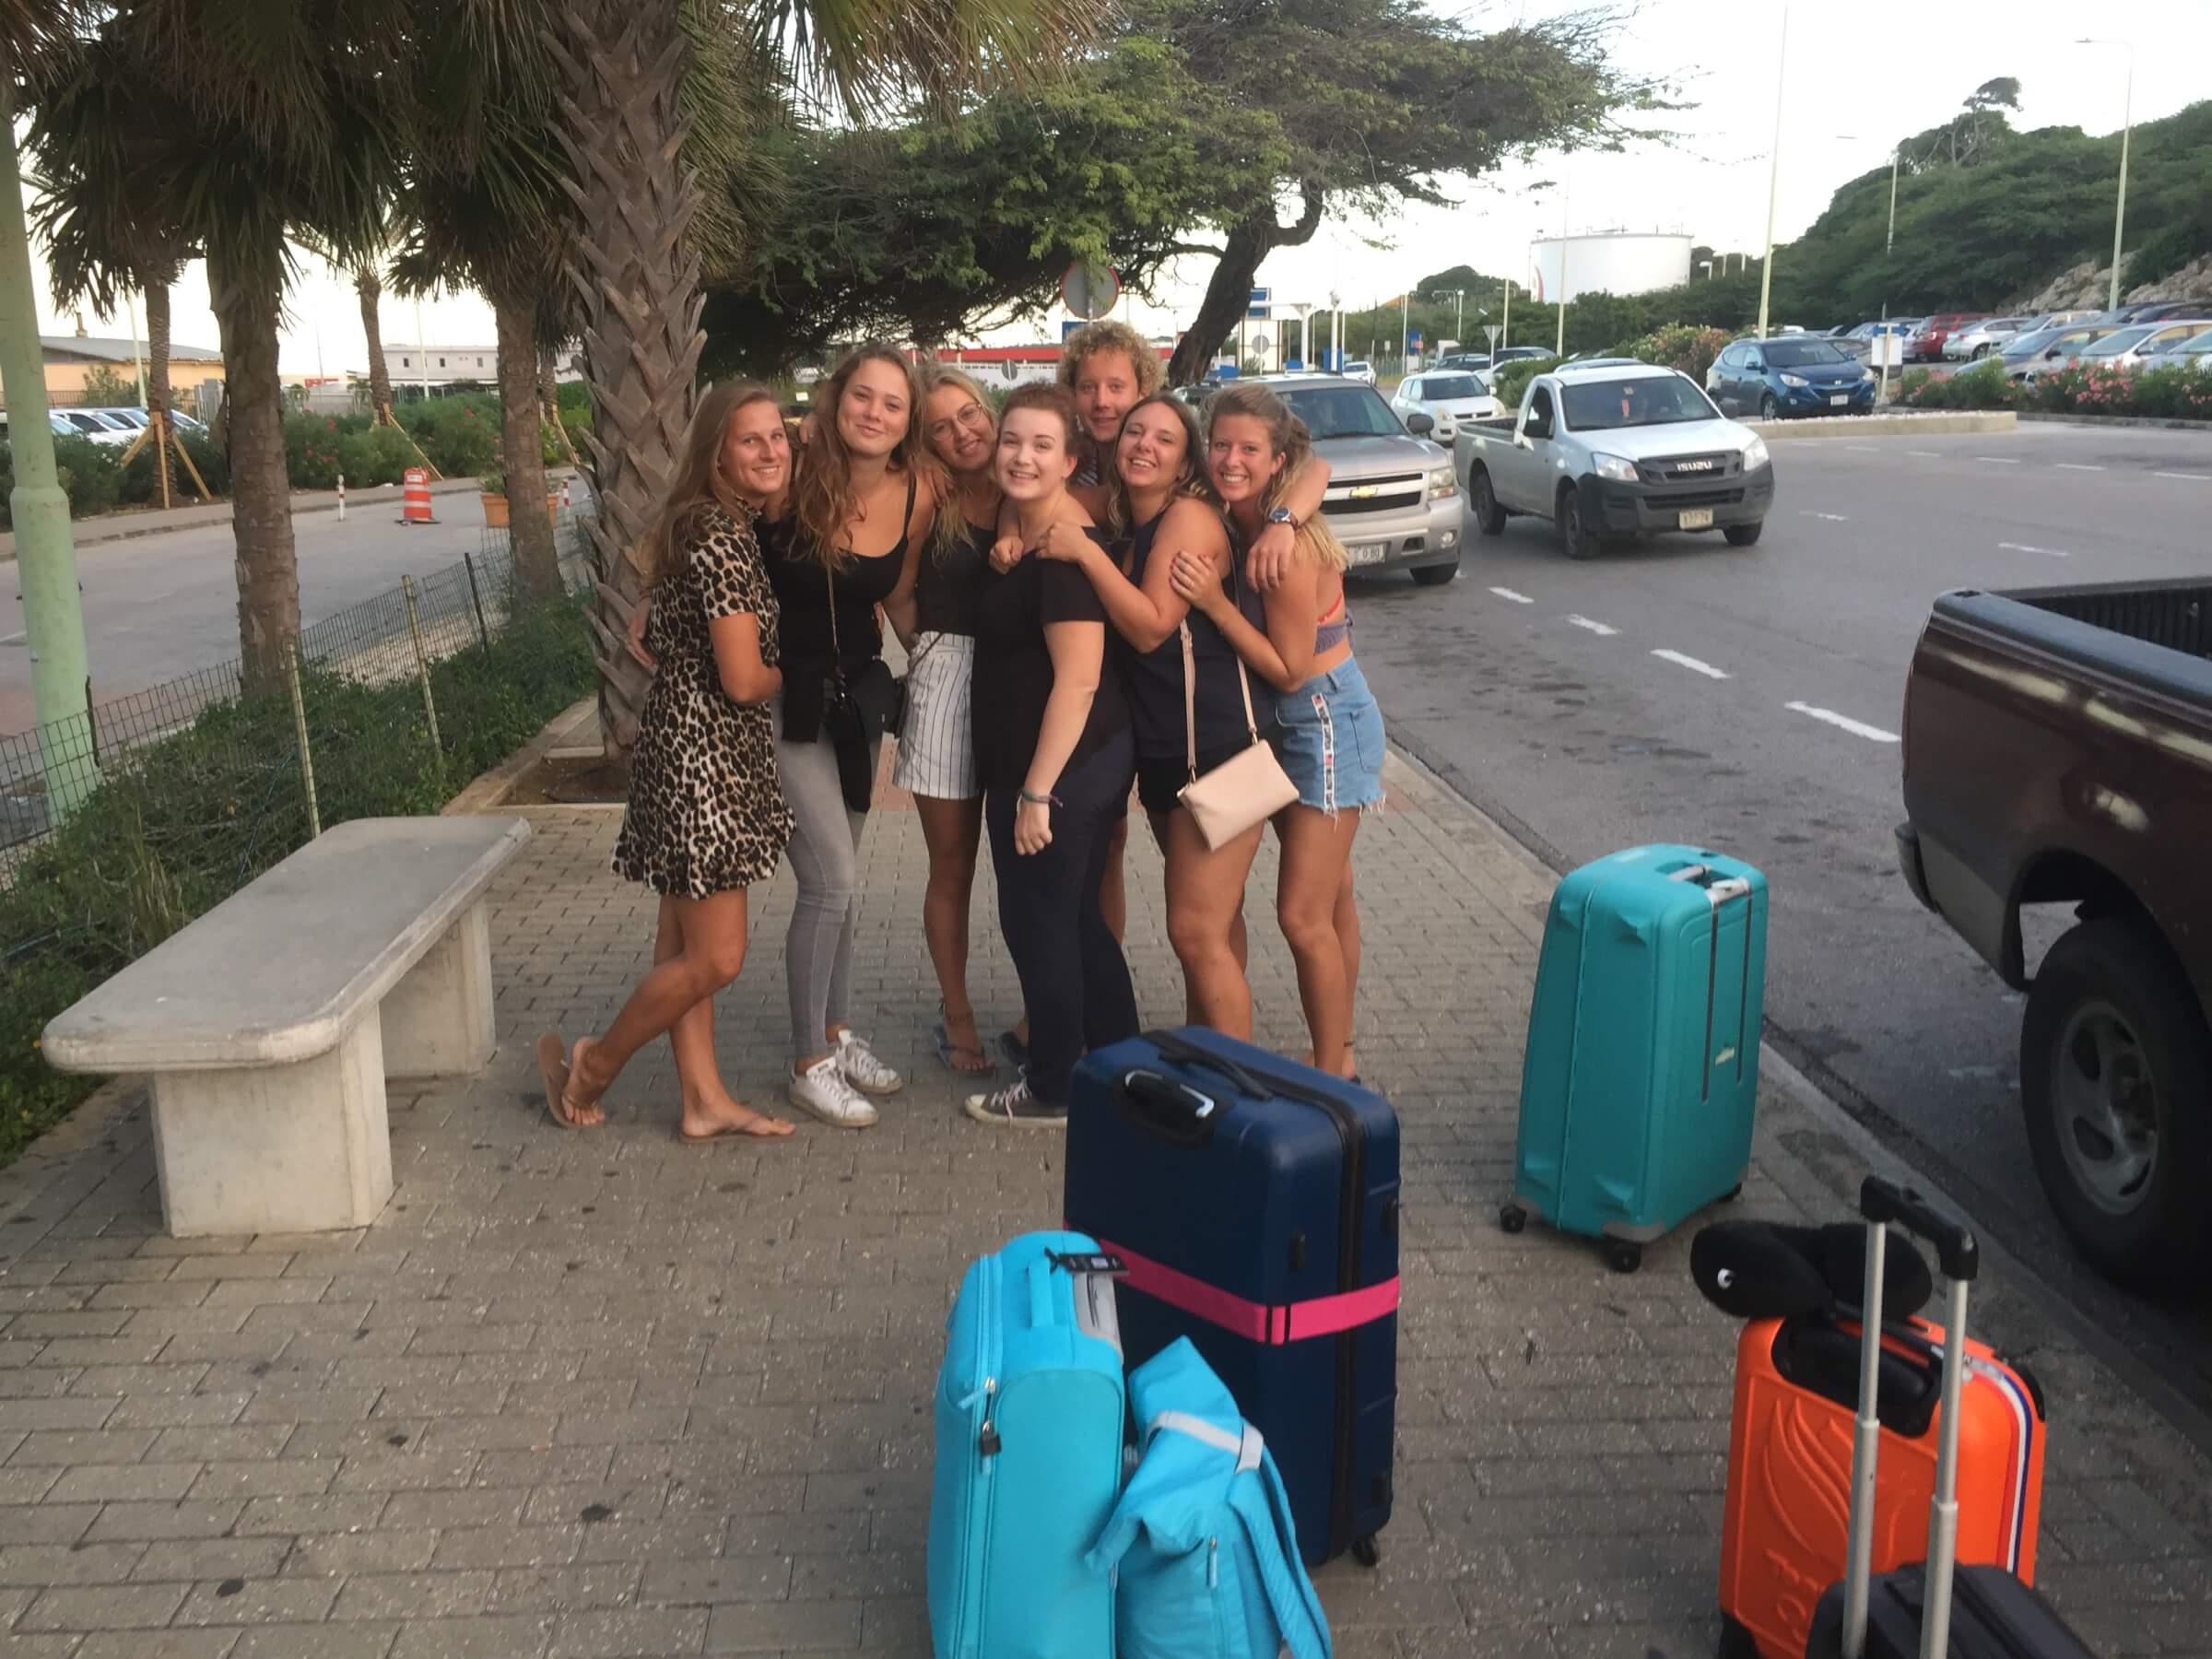 Haal en brengservice Curacao